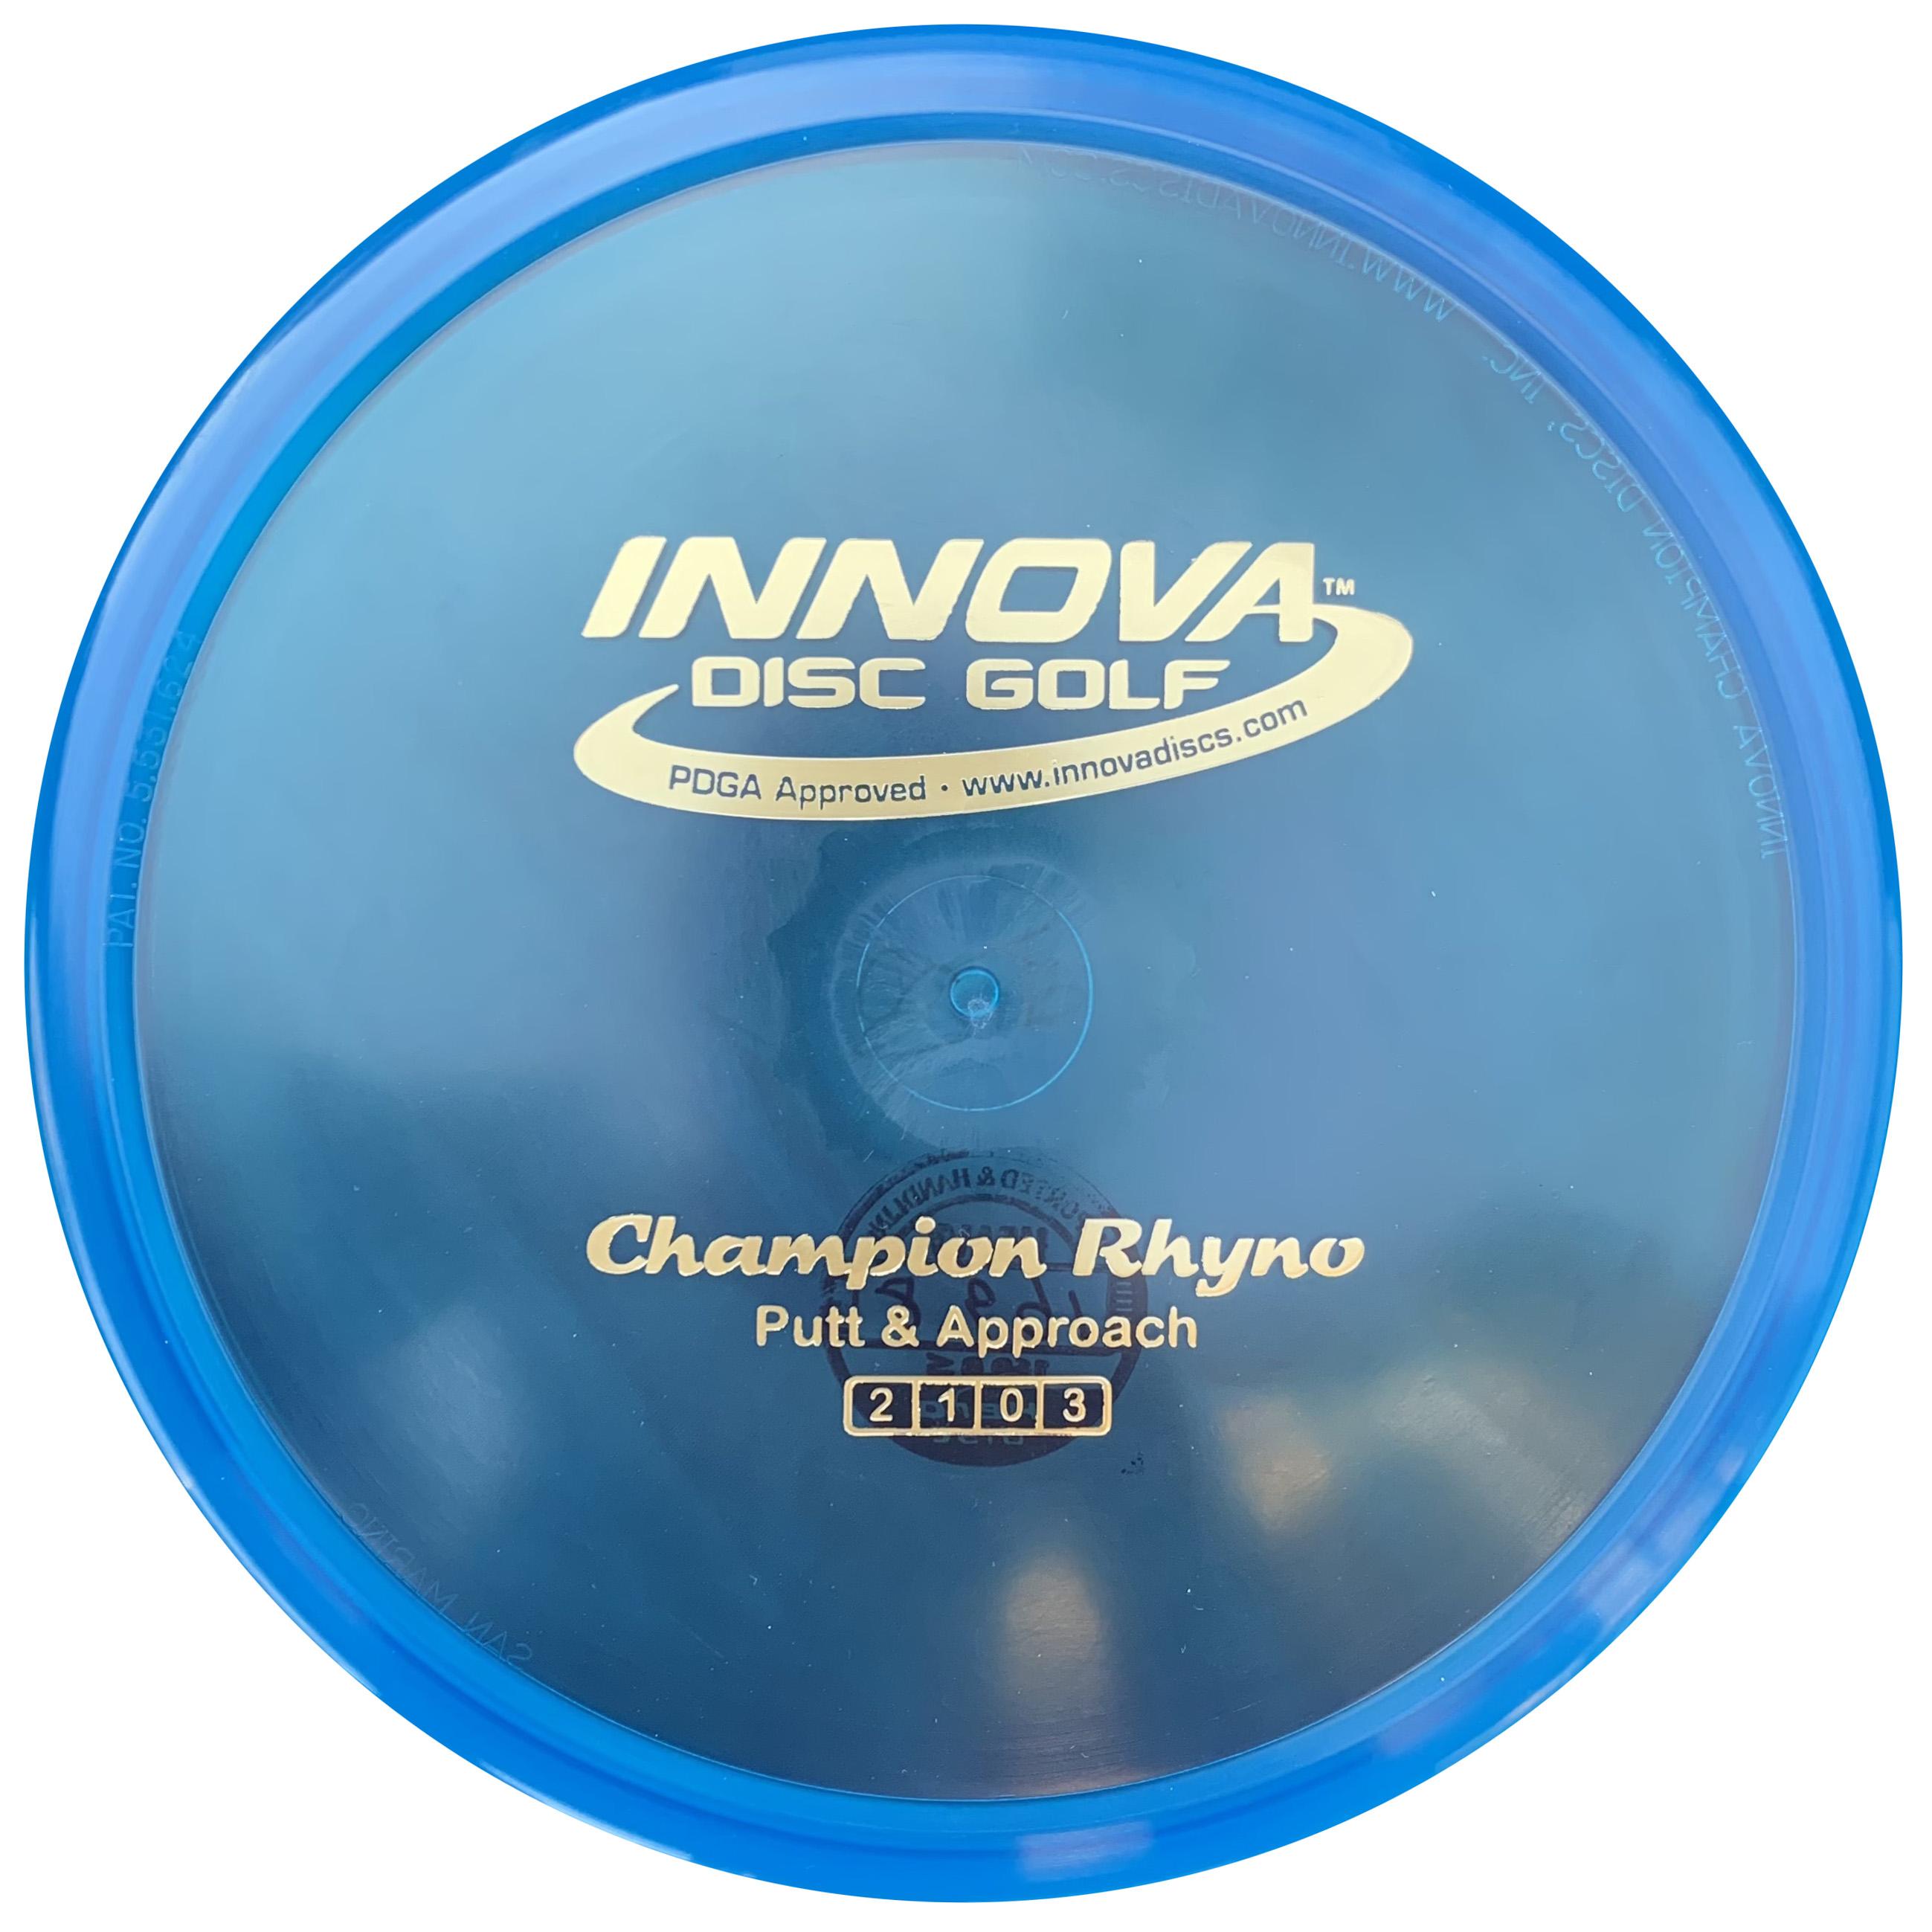 INNOVA チャンピオン ライノ